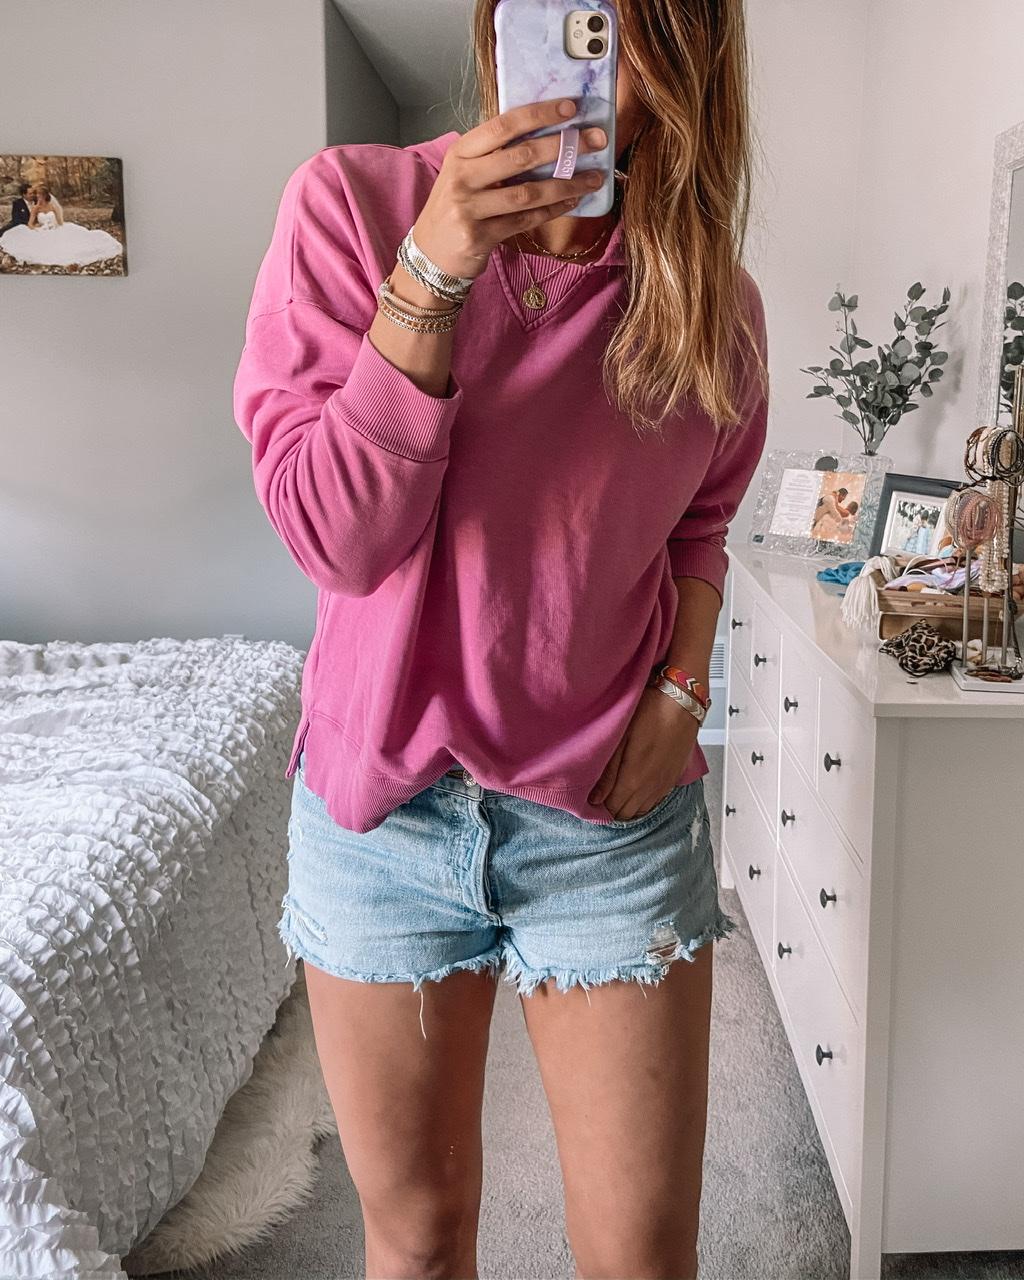 pink beach fleece sweatshirt universal threads target sweatshirt agolde parker light wash jean shorts layered gold necklace crystal cuff bracelet